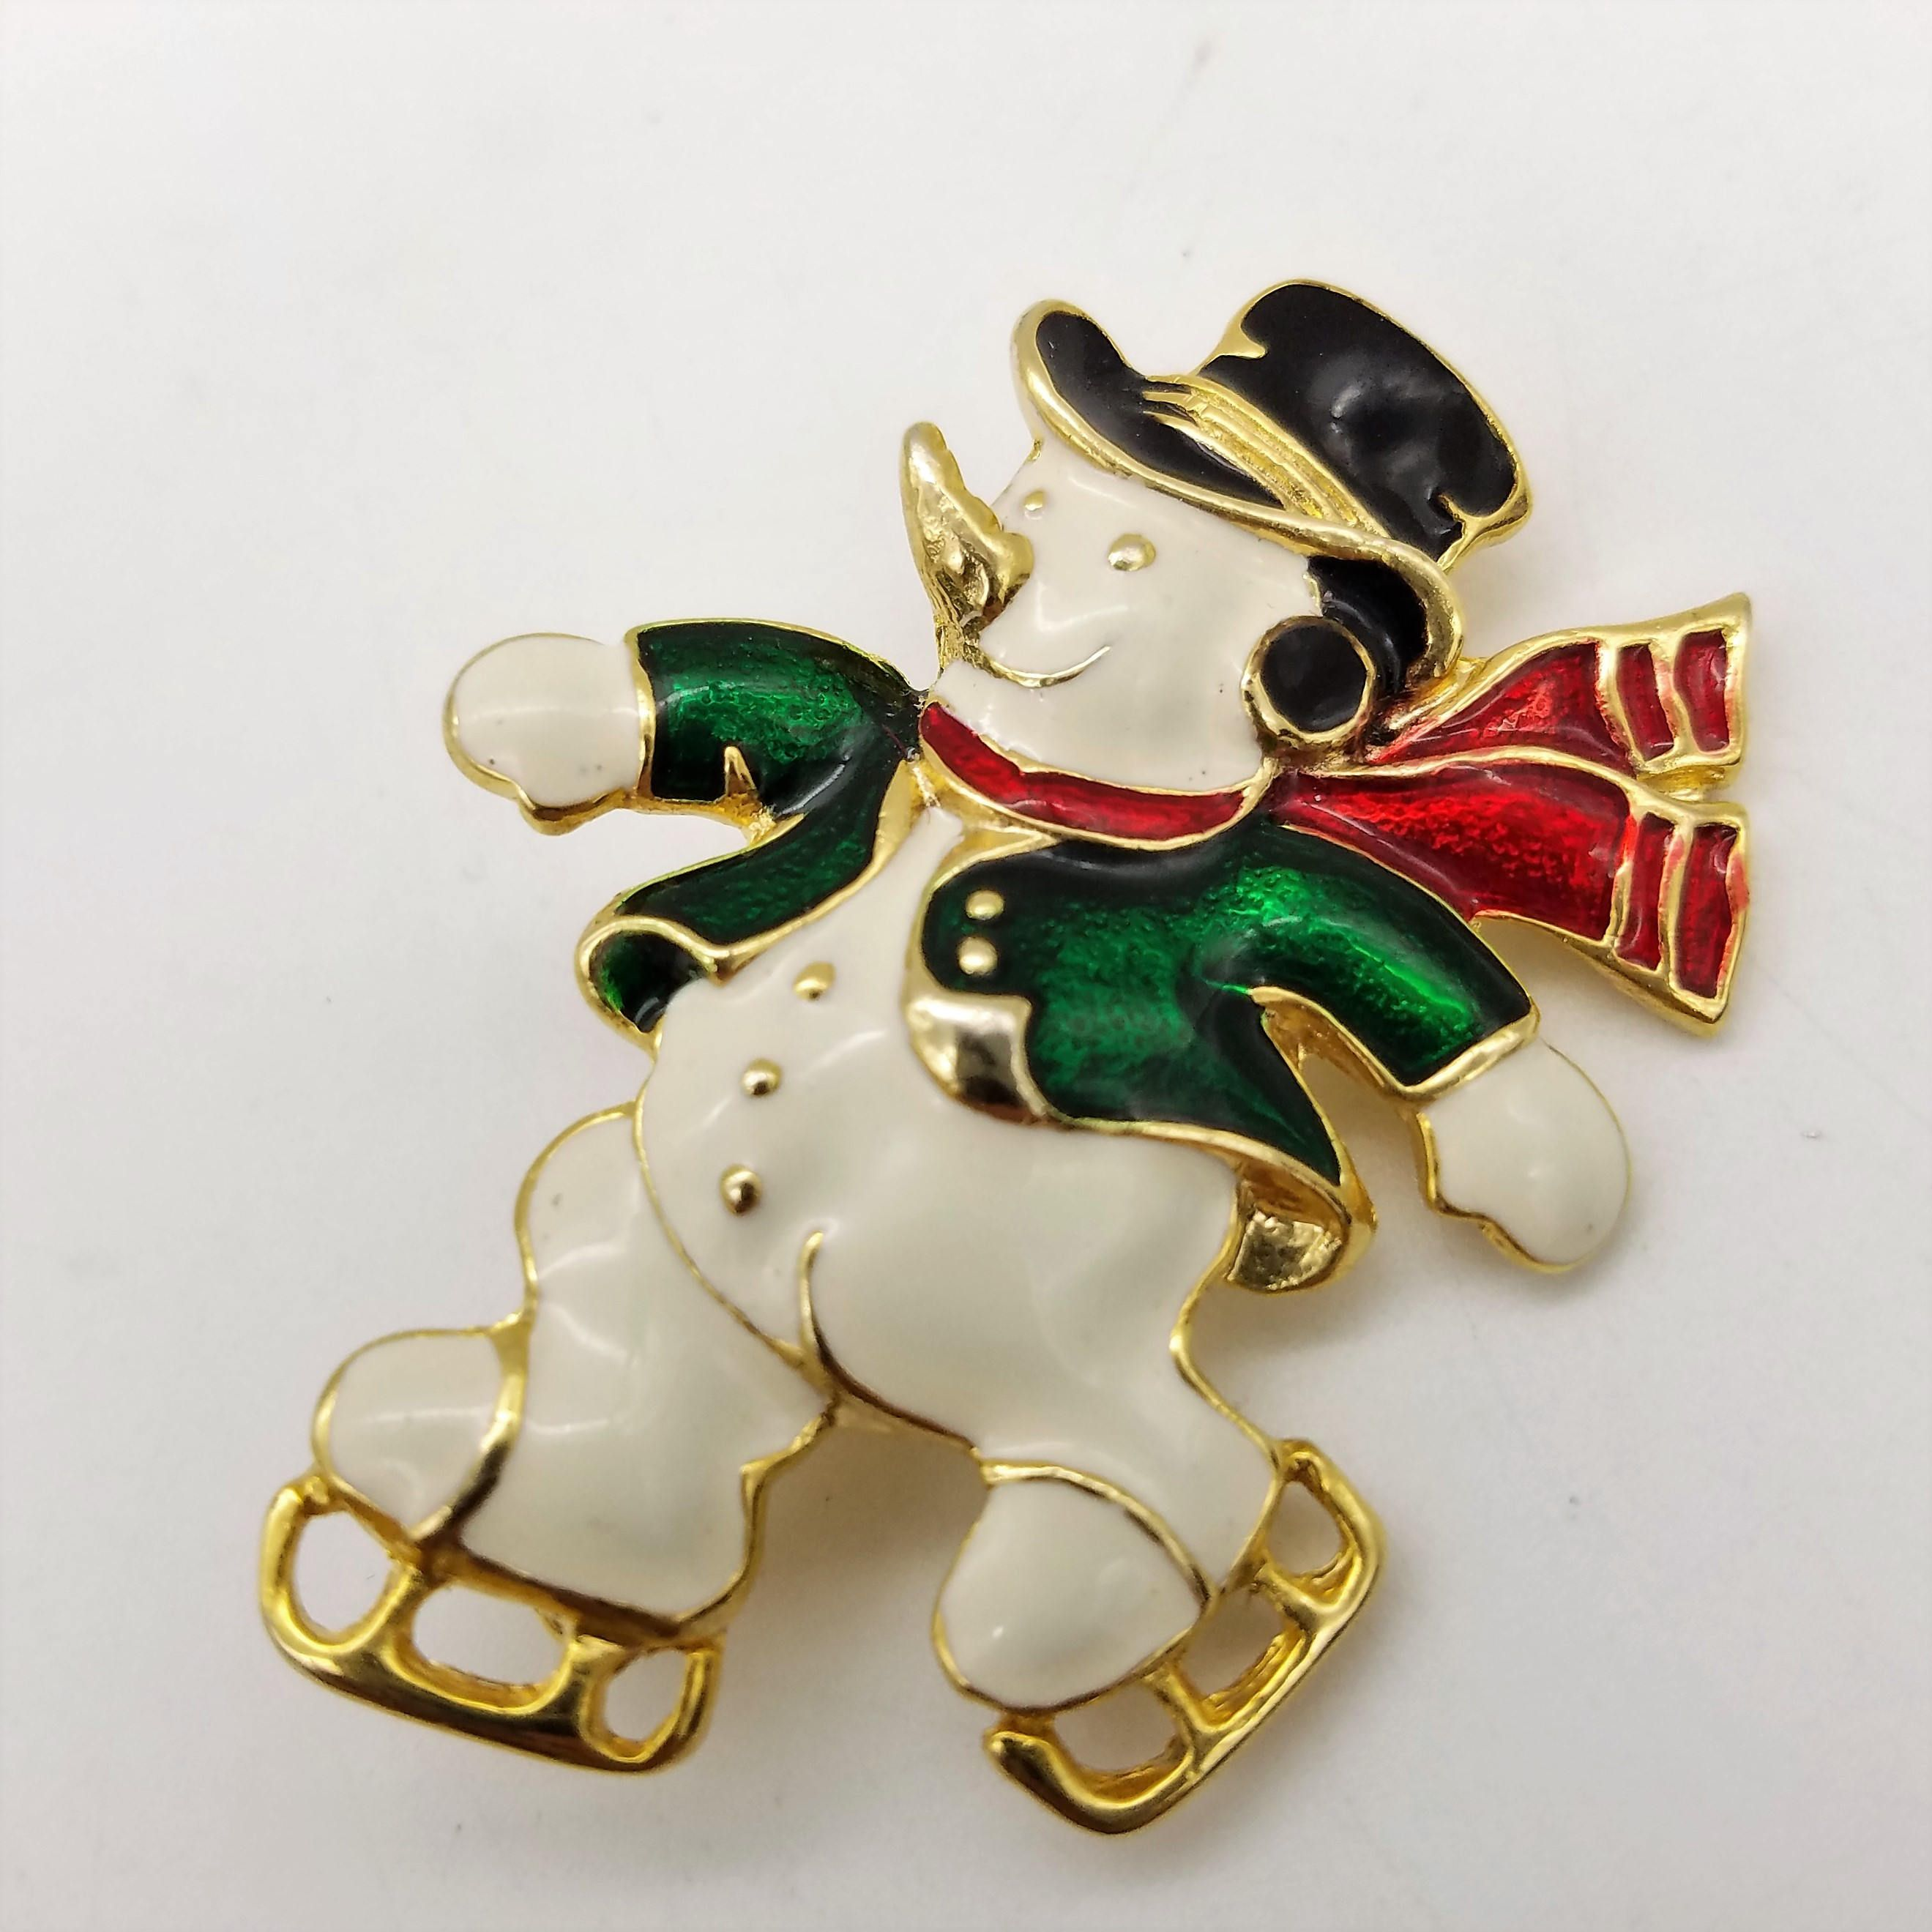 Vintage Skating Snowman Brooch